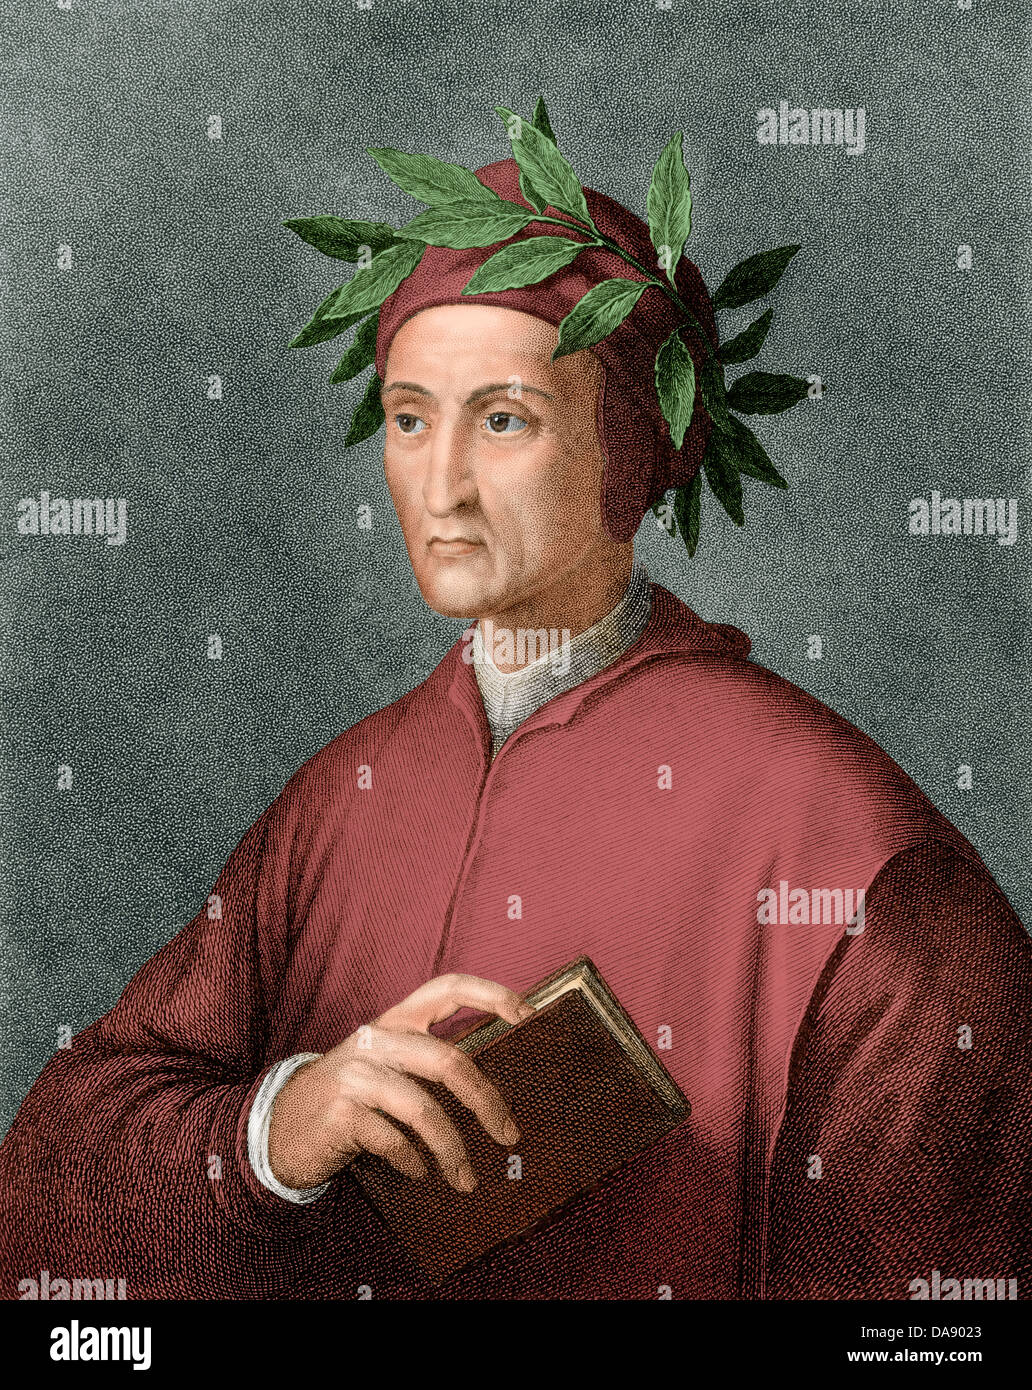 Dante Alighieri, poeta renacentista. Grabado pintado digitalmente Imagen De Stock